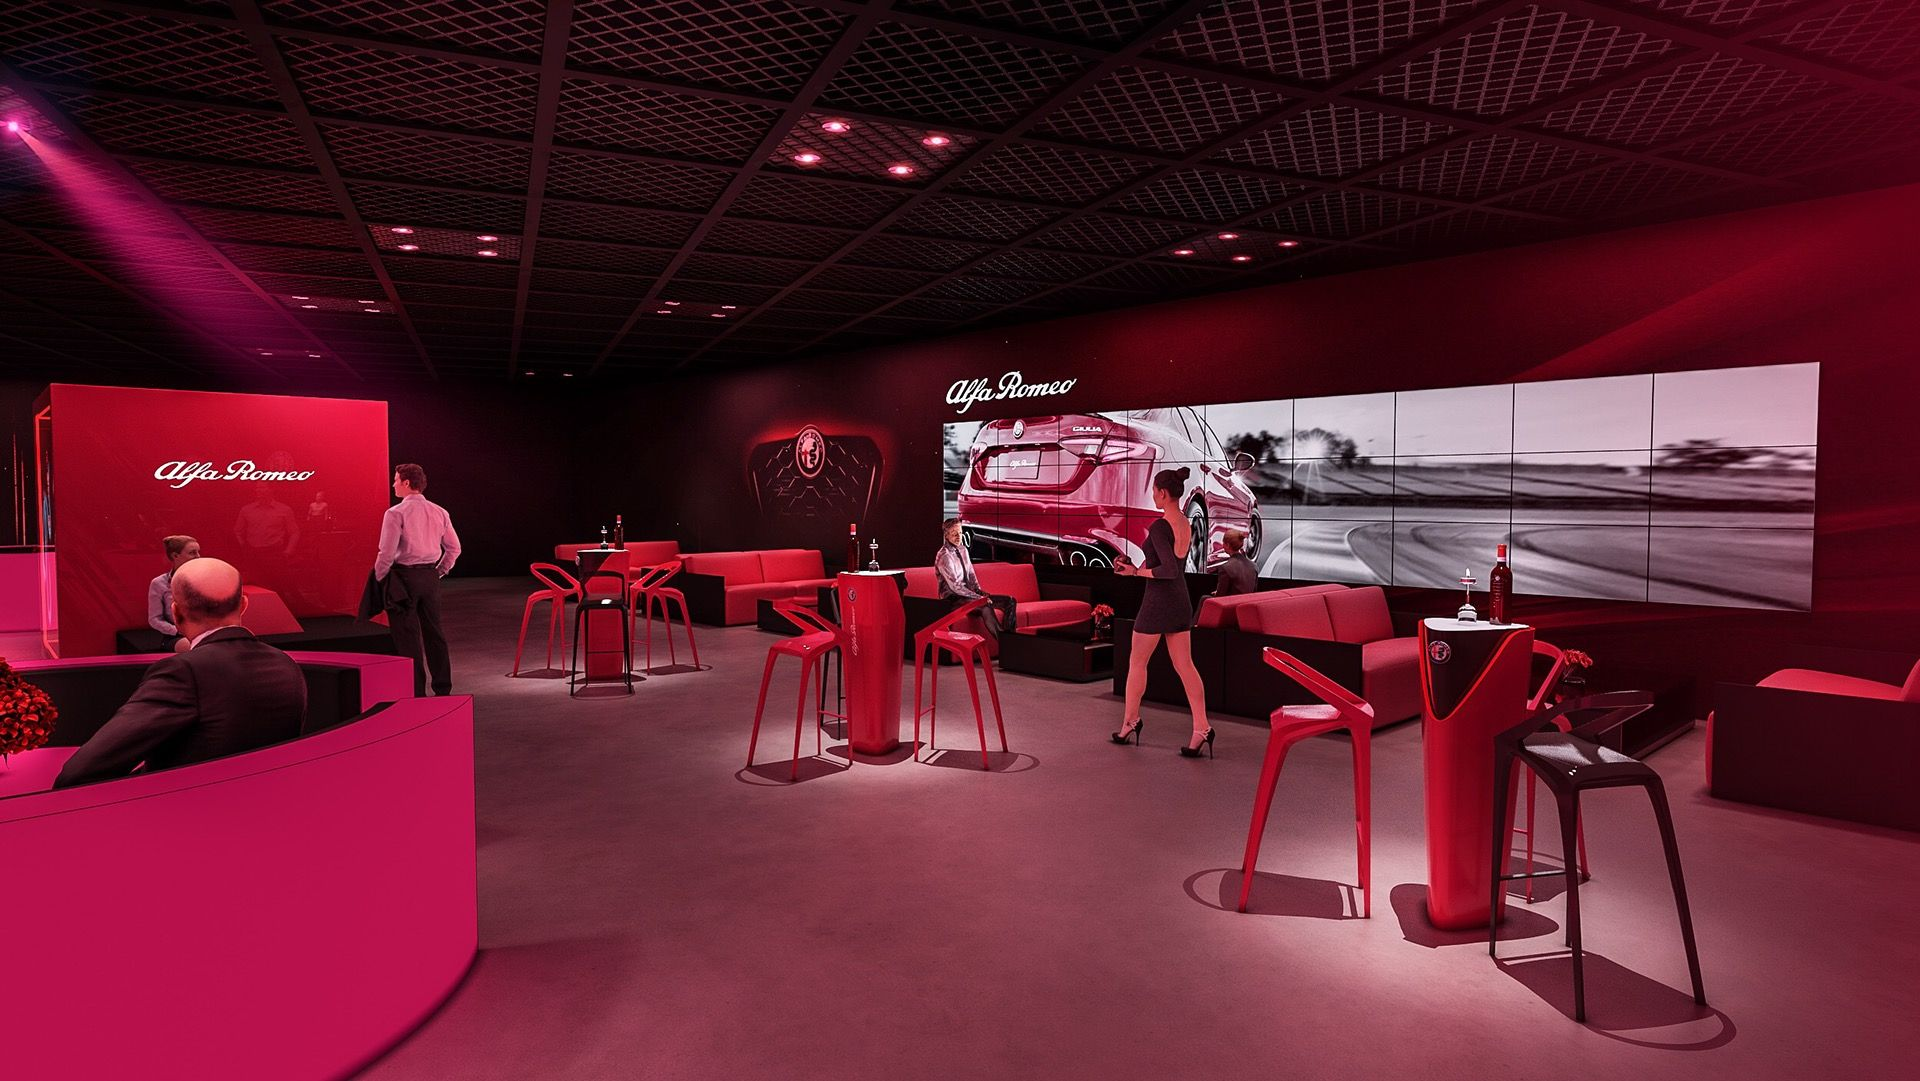 Alfa Romeo After Party On Behance Alfa Romeo Adobe Photoshop Lightroom Photoshop Lightroom